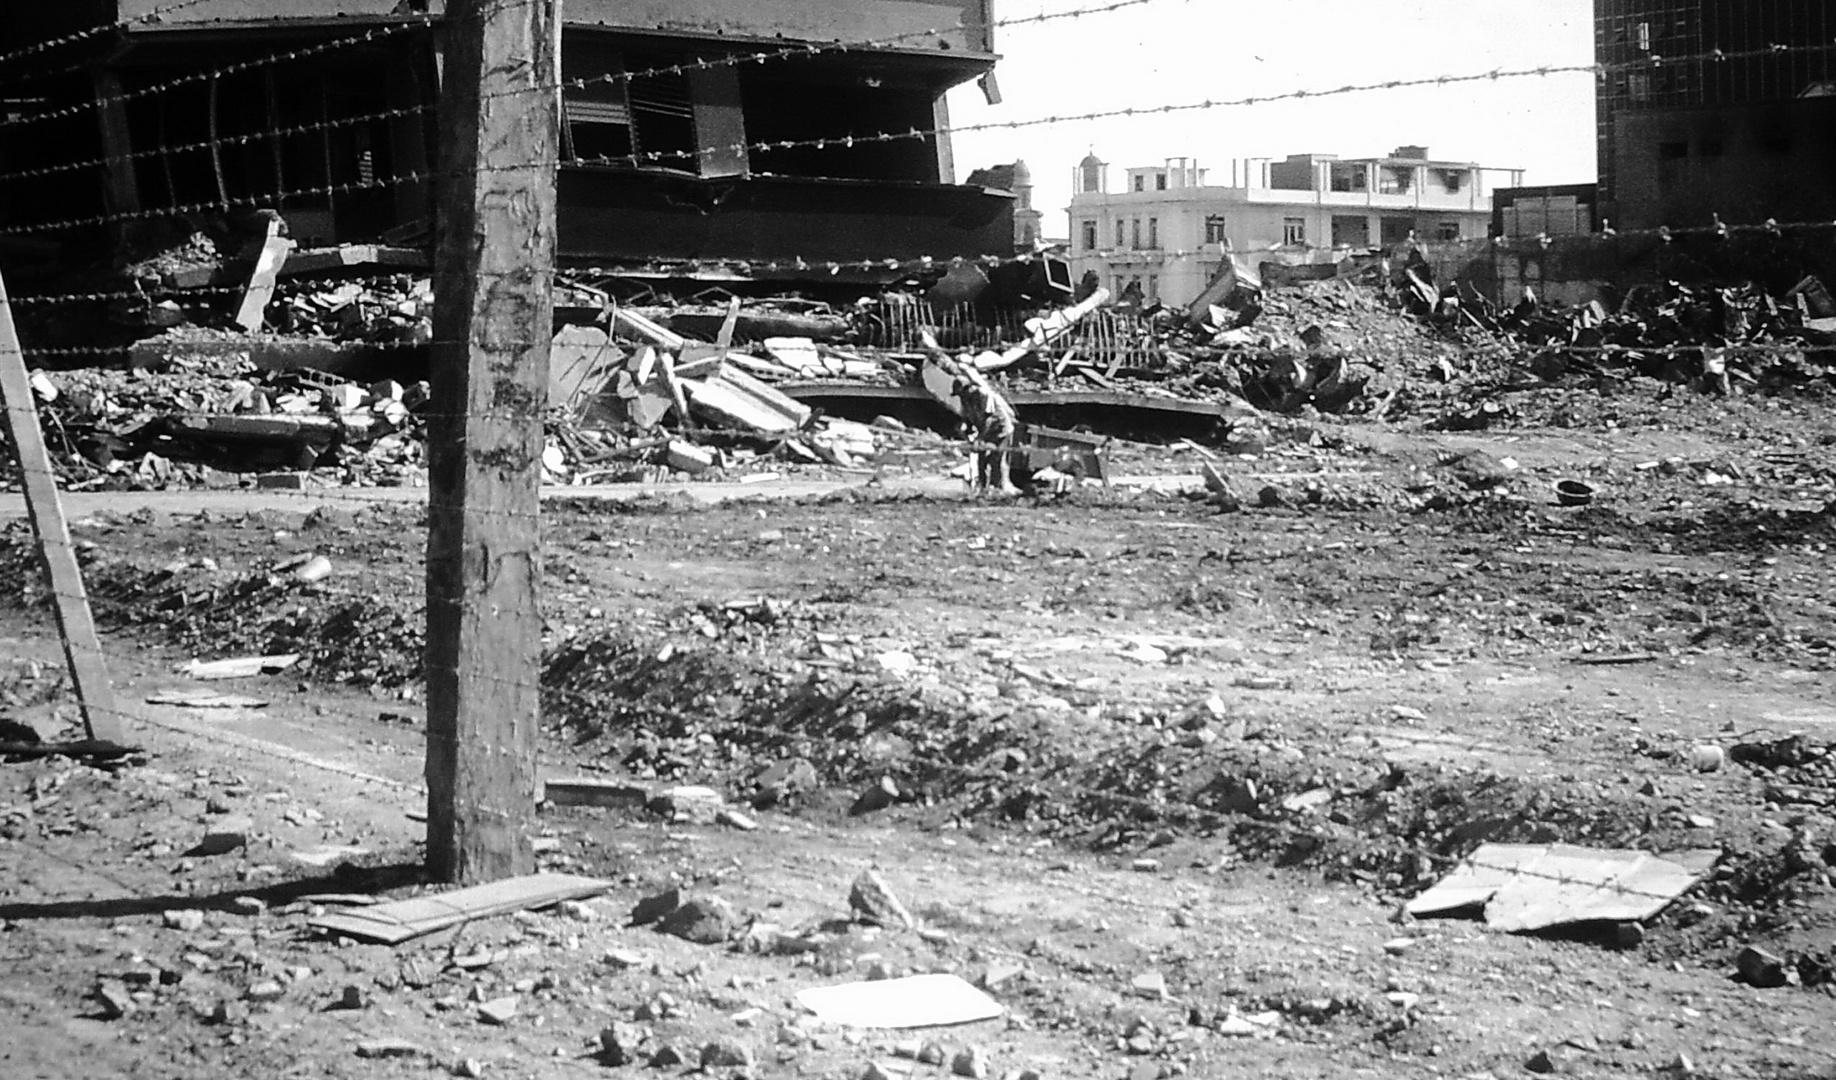 Erdbeben in Managua 23.12.1972